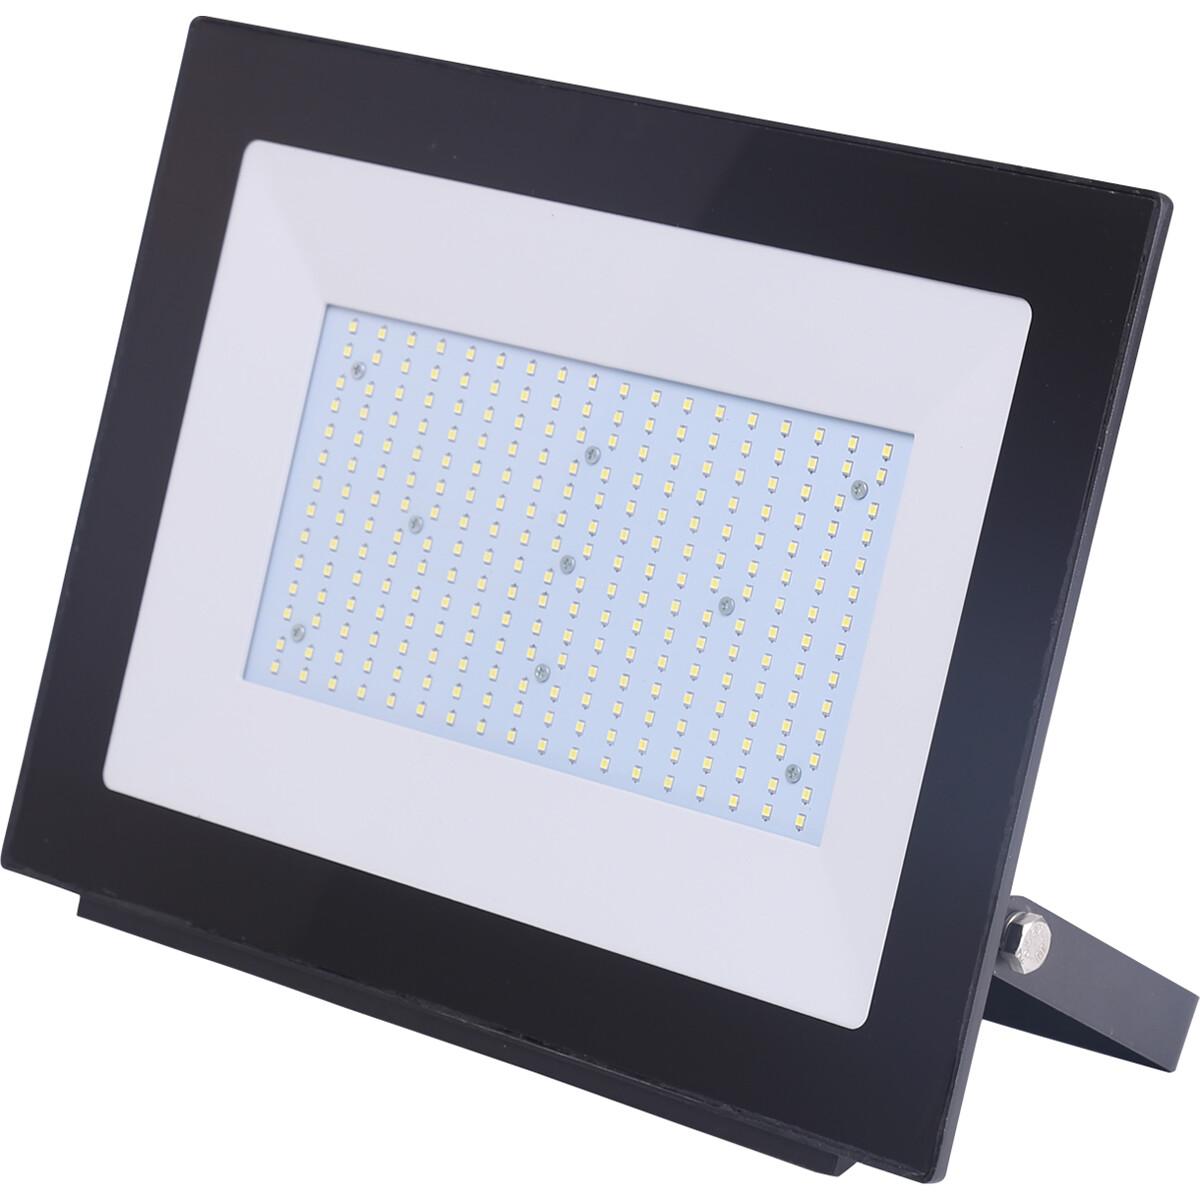 LED Bouwlamp 200 Watt - LED Schijnwerper - Aigi Iglo - Helder/Koud Wit 6400K - Waterdicht IP65 - Mat Zwart - Aluminium